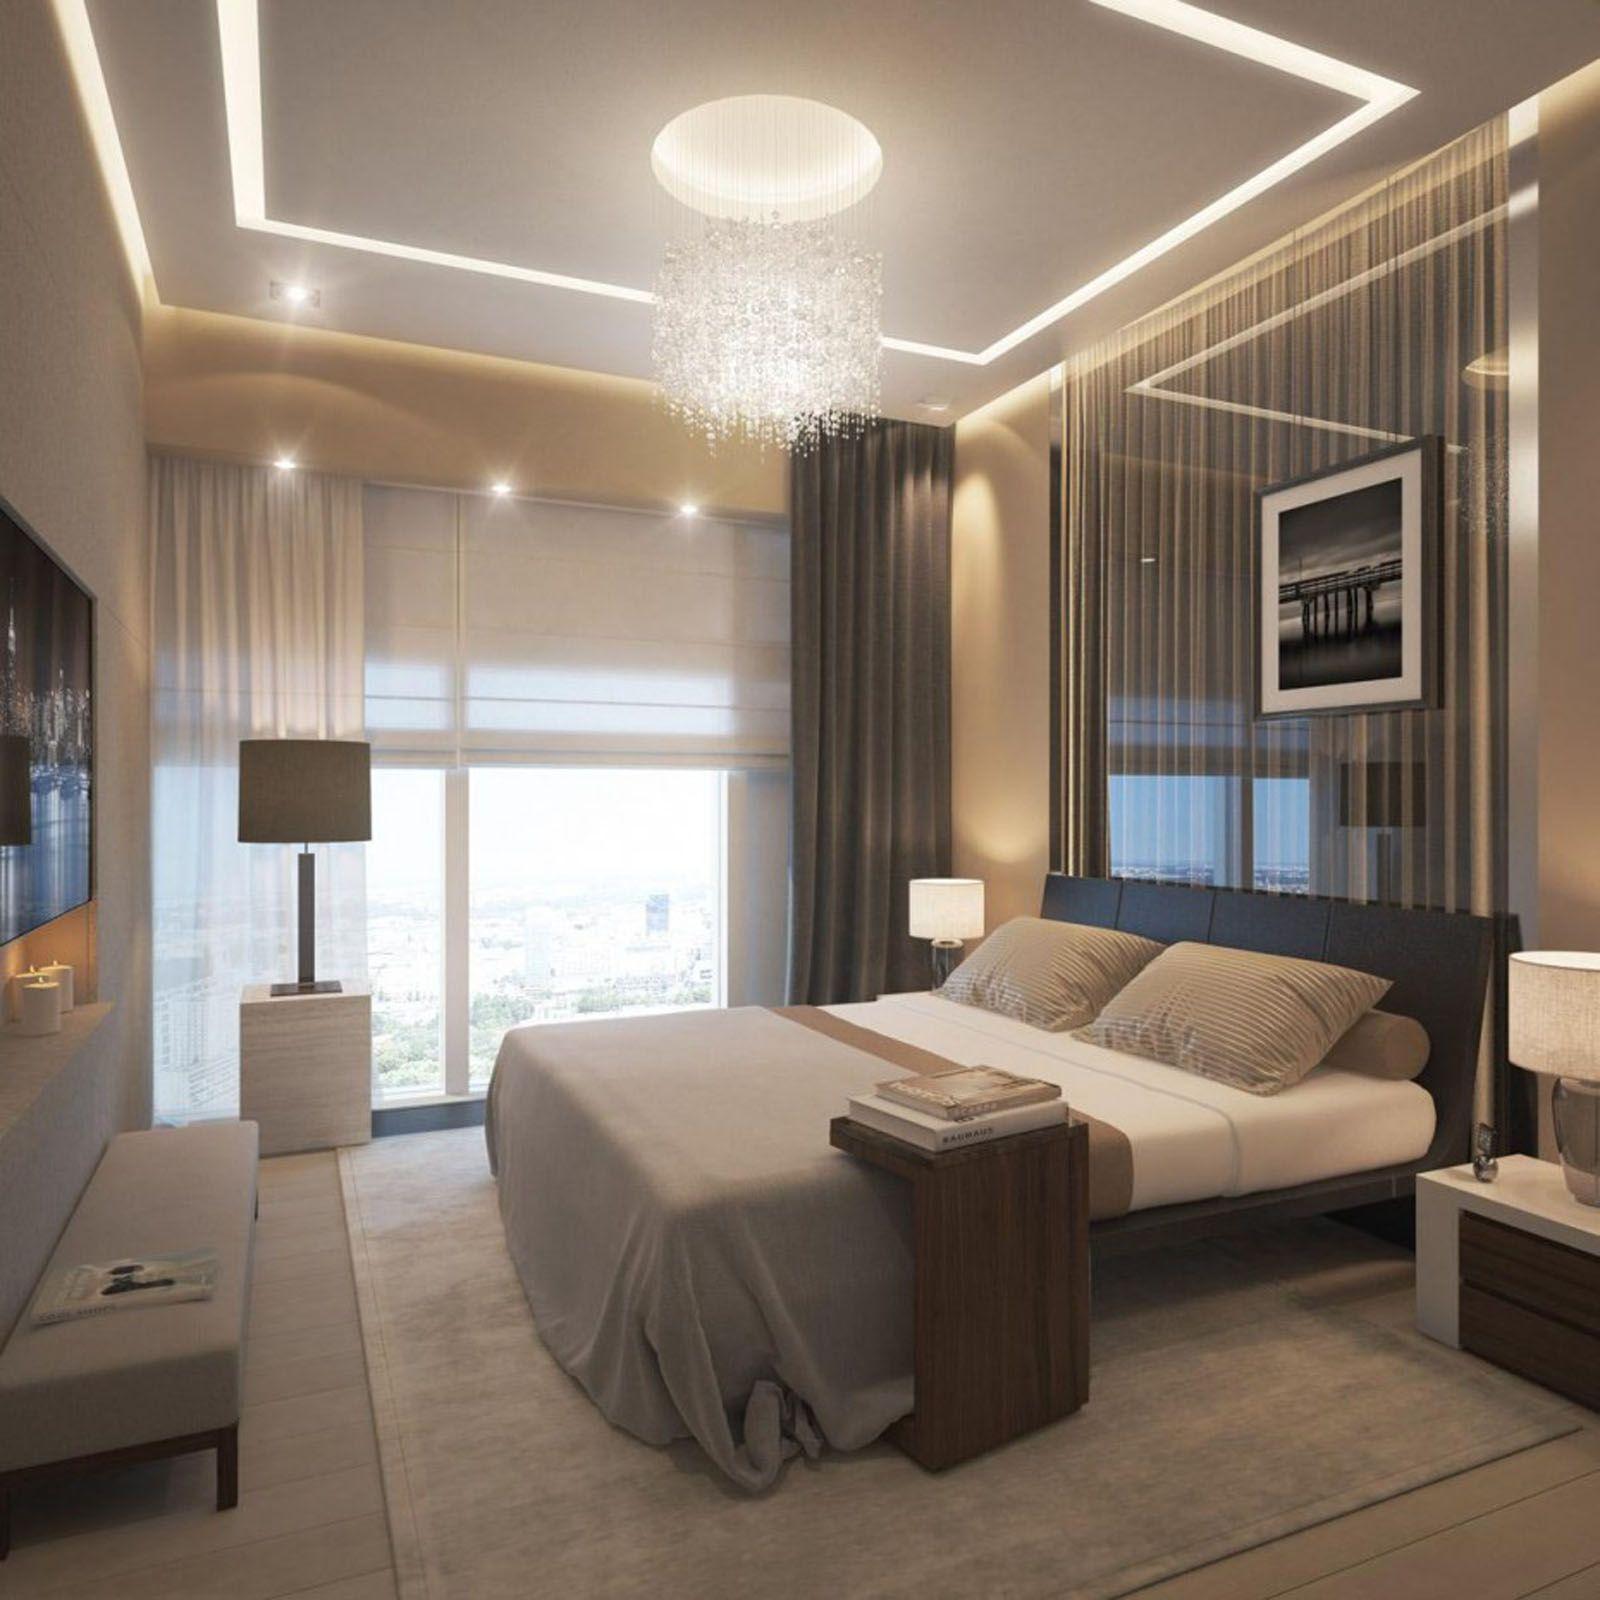 Coole Idee Schlafzimmer Decke Beleuchtung Ideen Gewolbten Schlafzimmer Decke Beleuchtung Id Schlafzimmer Design Hauptschlafzimmer Schone Schlafzimmer